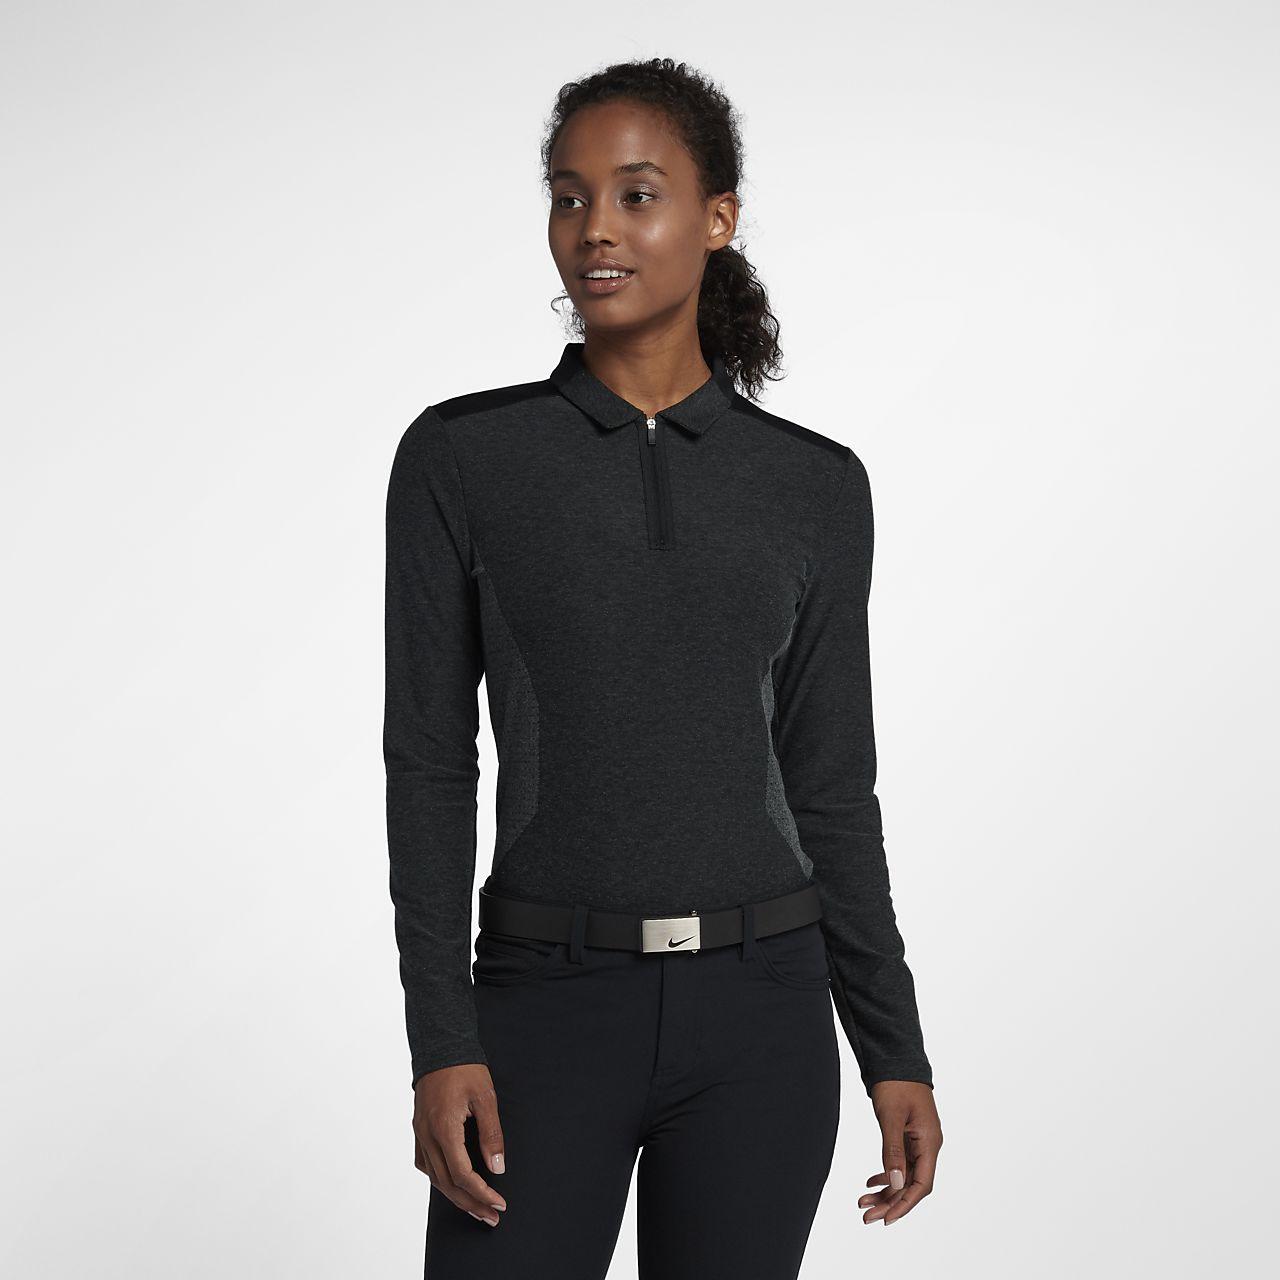 Nike Zonal Cooling Golfpolo met lange mouwen voor dames